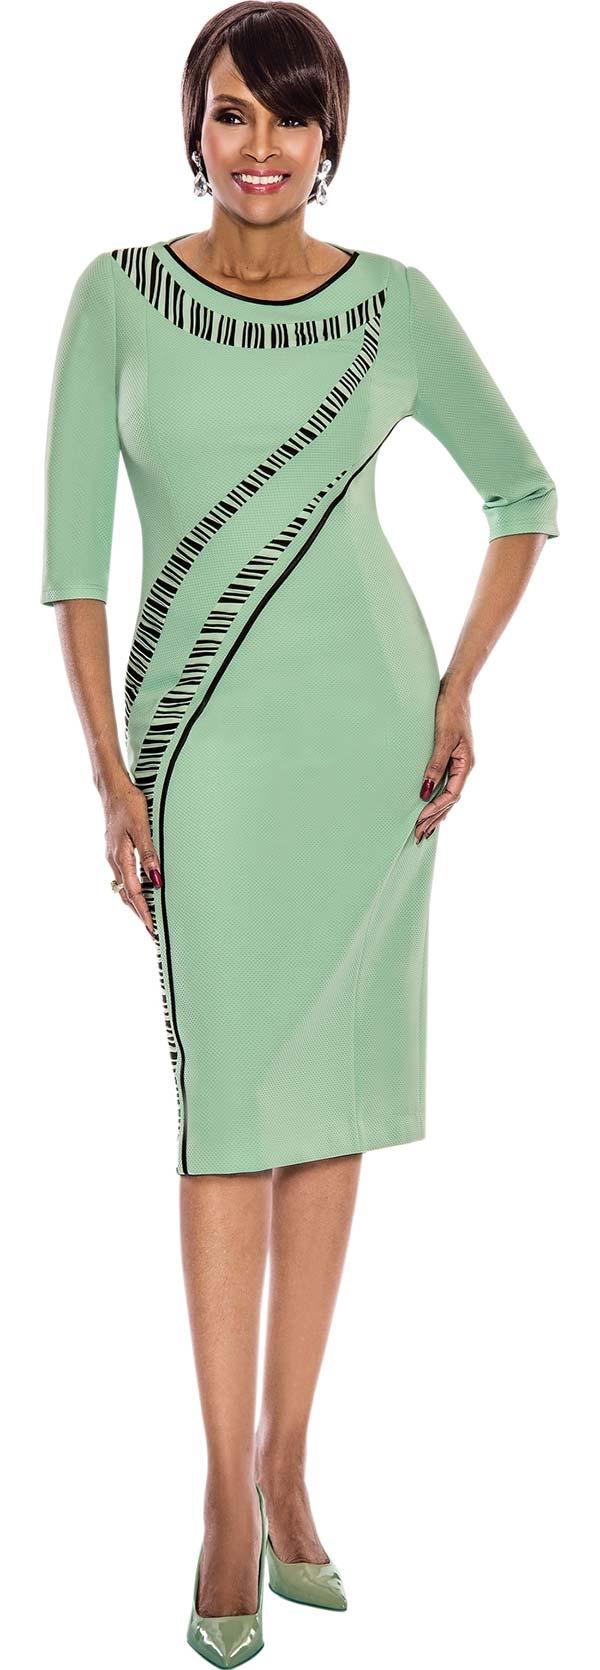 Terramina 7538-Mint - Ladies Threee Quarter Sleeve Sheath Dress With Stripe Detailing